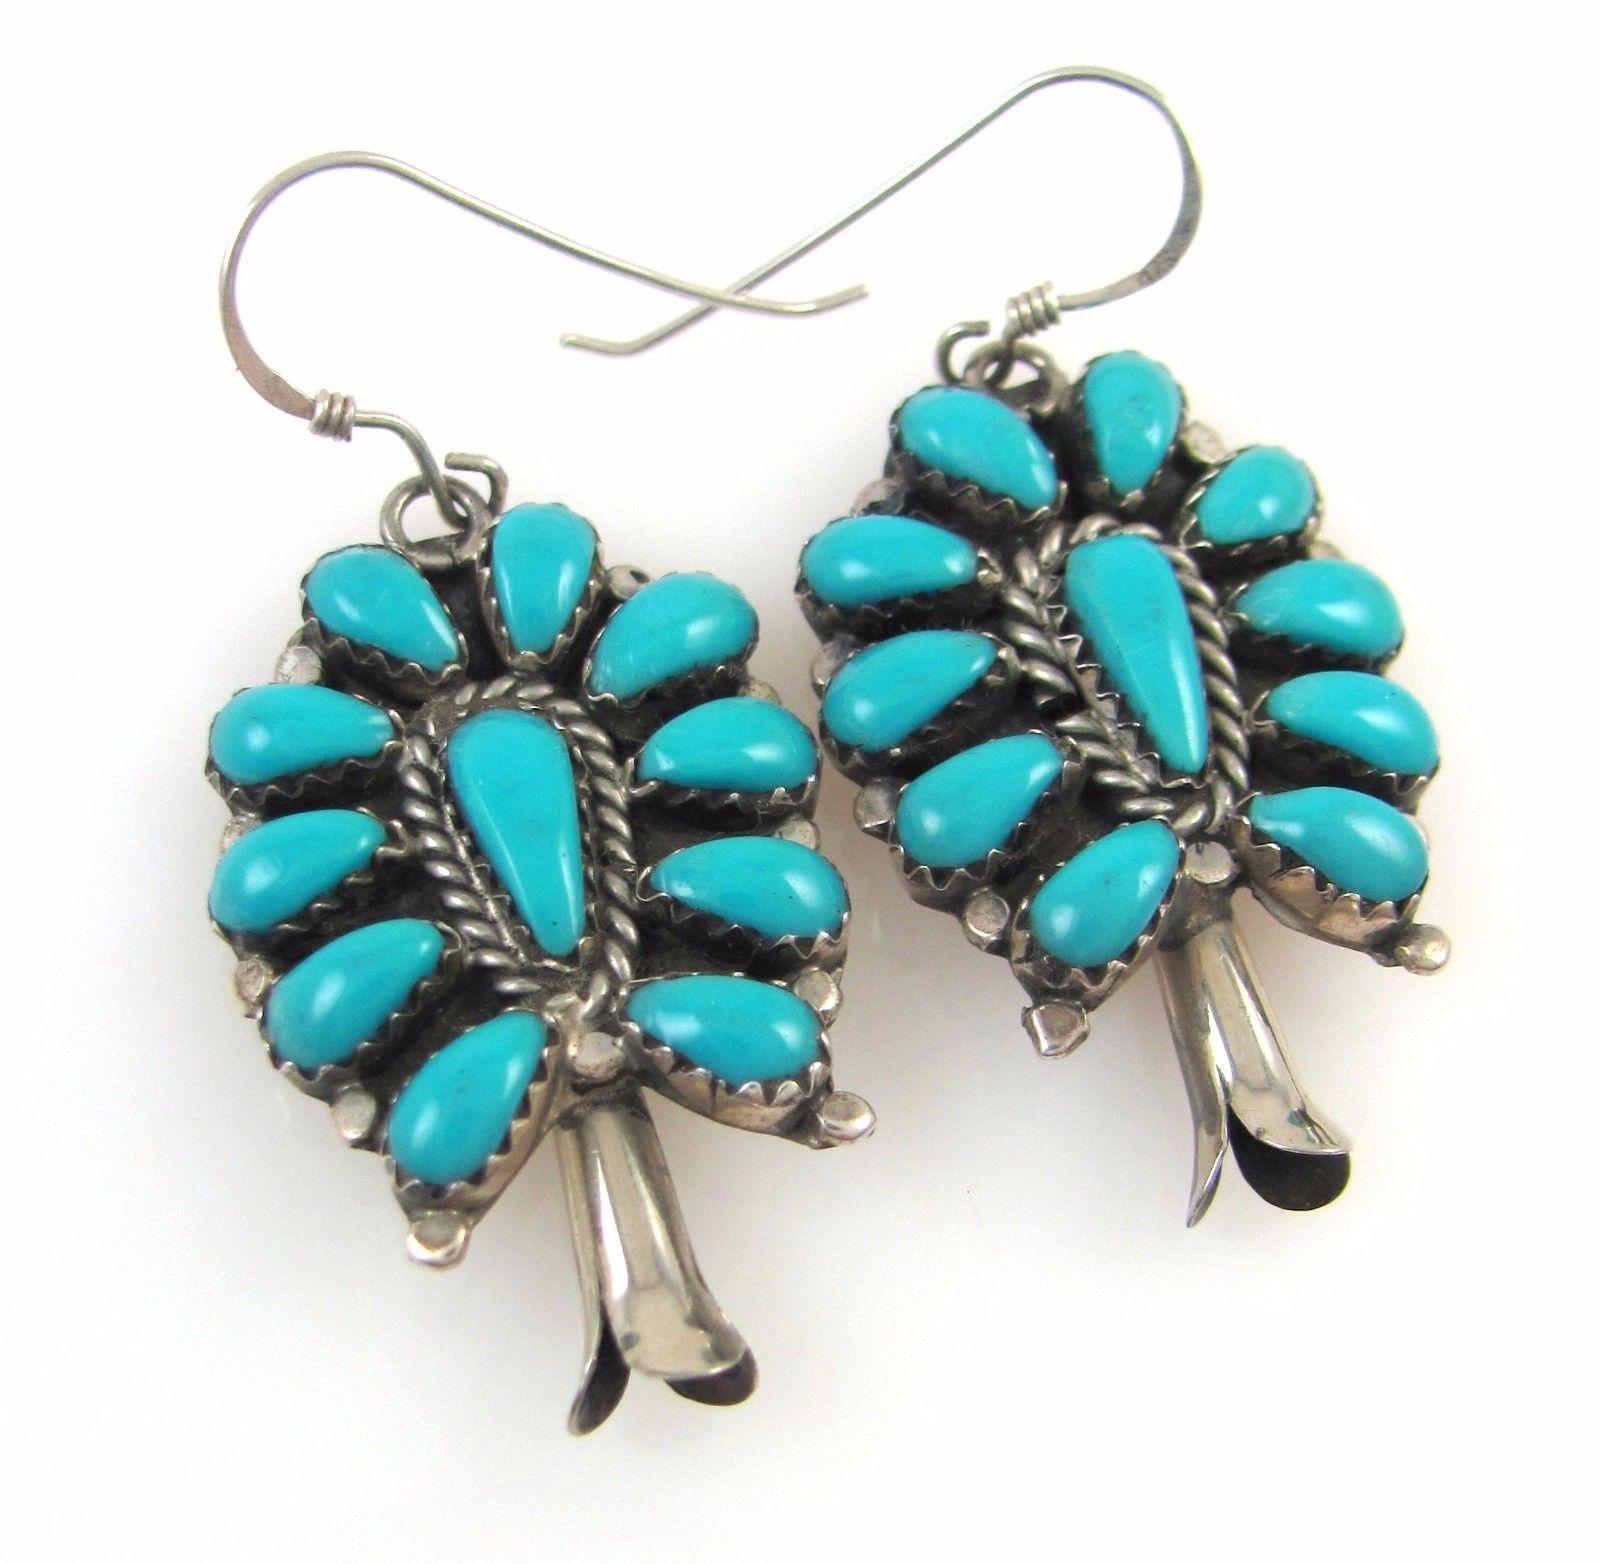 Vintage Navajo Sterling Silver Petit Point Turquoise Squash Blossom Earrings J R https://t.co/Zp6TQt4Ecp https://t.co/oqeV8Has9m